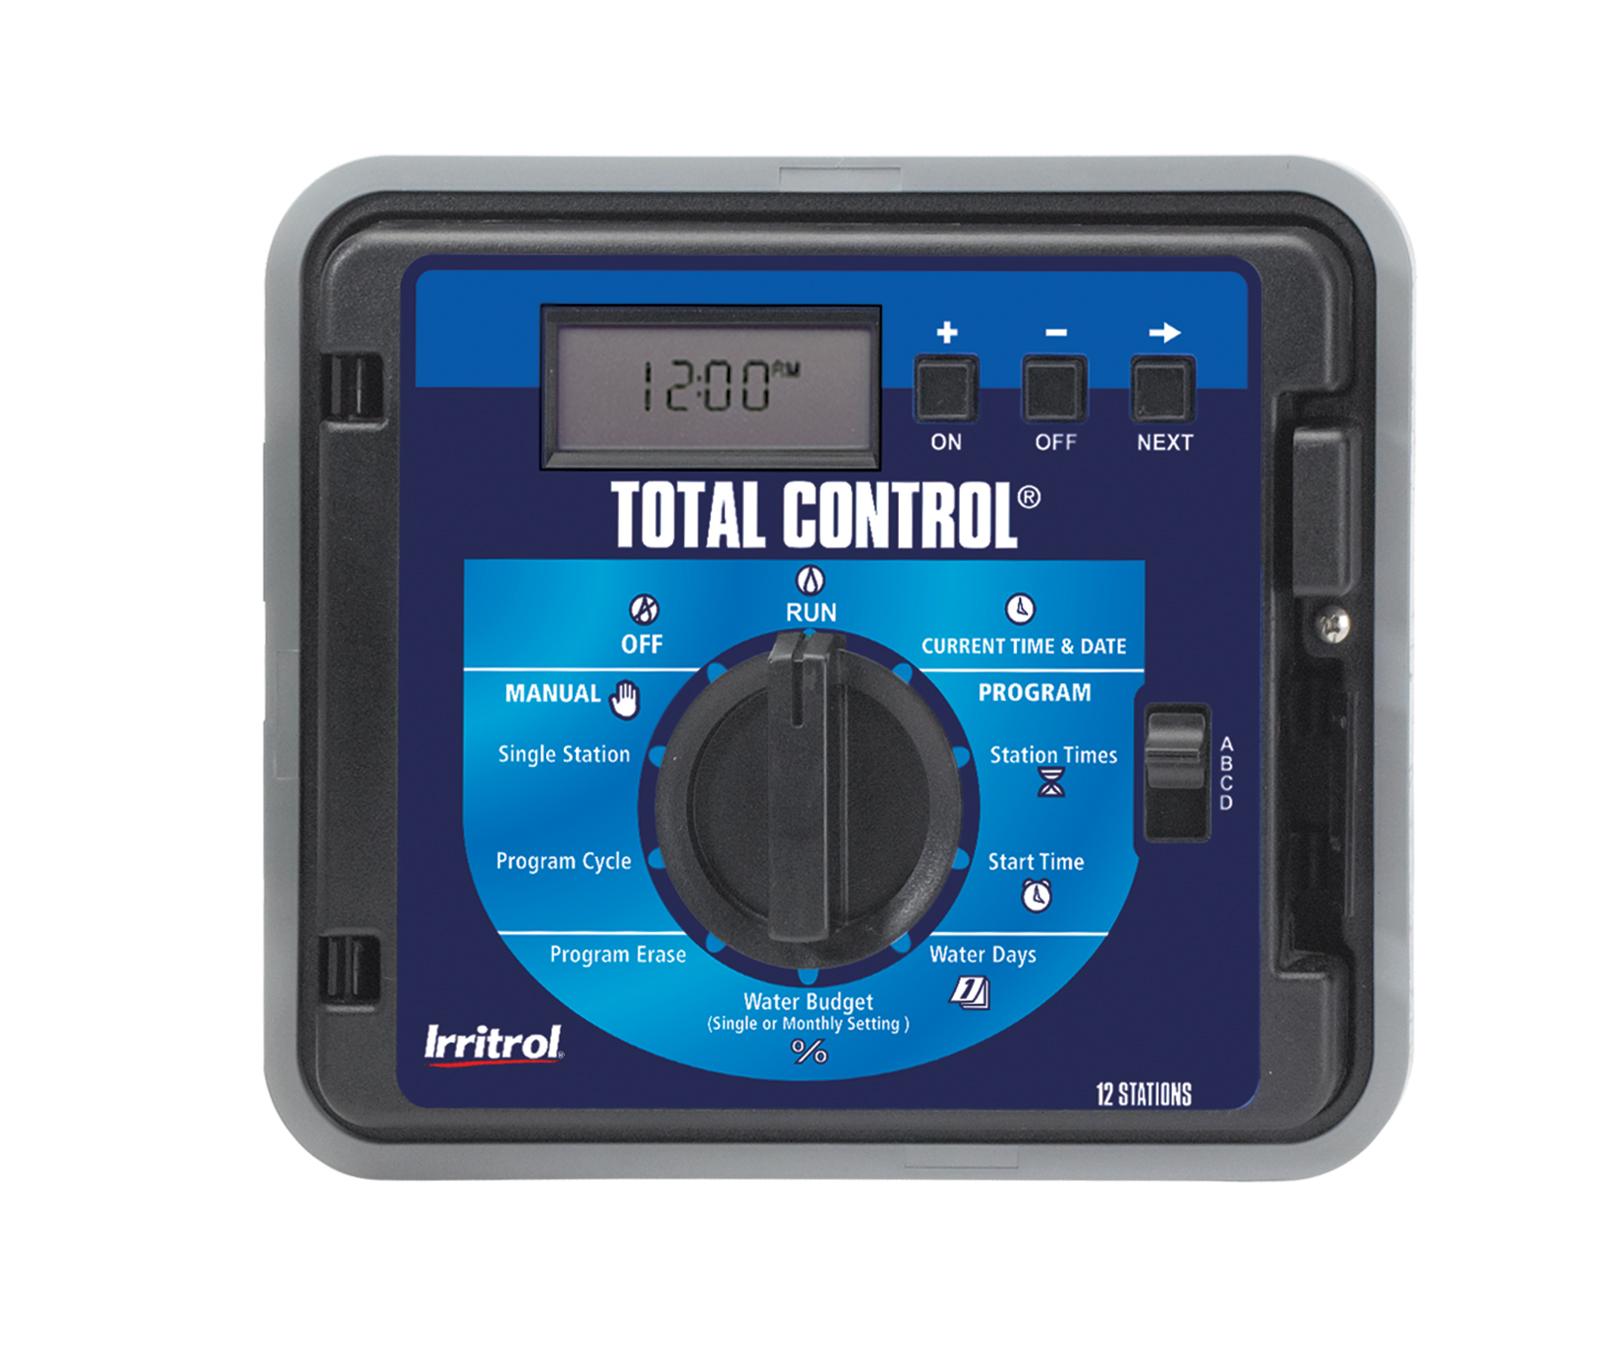 totalcontrol_studio.ashx?mw=700&mh=599&hash=6EFAD1DBB6895035AC59BC700E5A0A80979D3319 irritrol total control r series Basic Electrical Wiring Diagrams at reclaimingppi.co